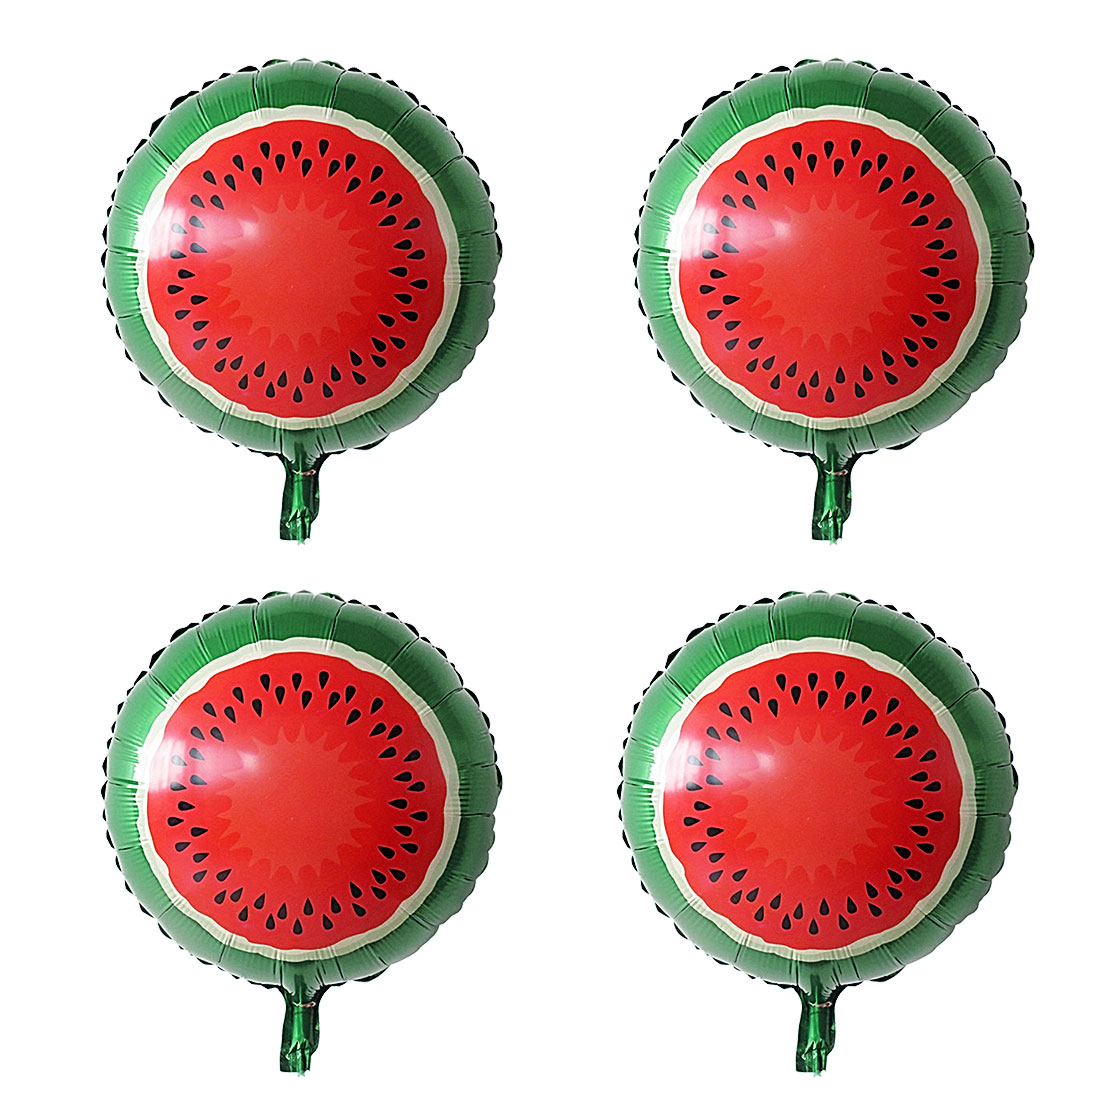 Foil Watermelon Print Balloon Mylar Balloons Wedding Party Celebration Decor 13 Inch 4pcs